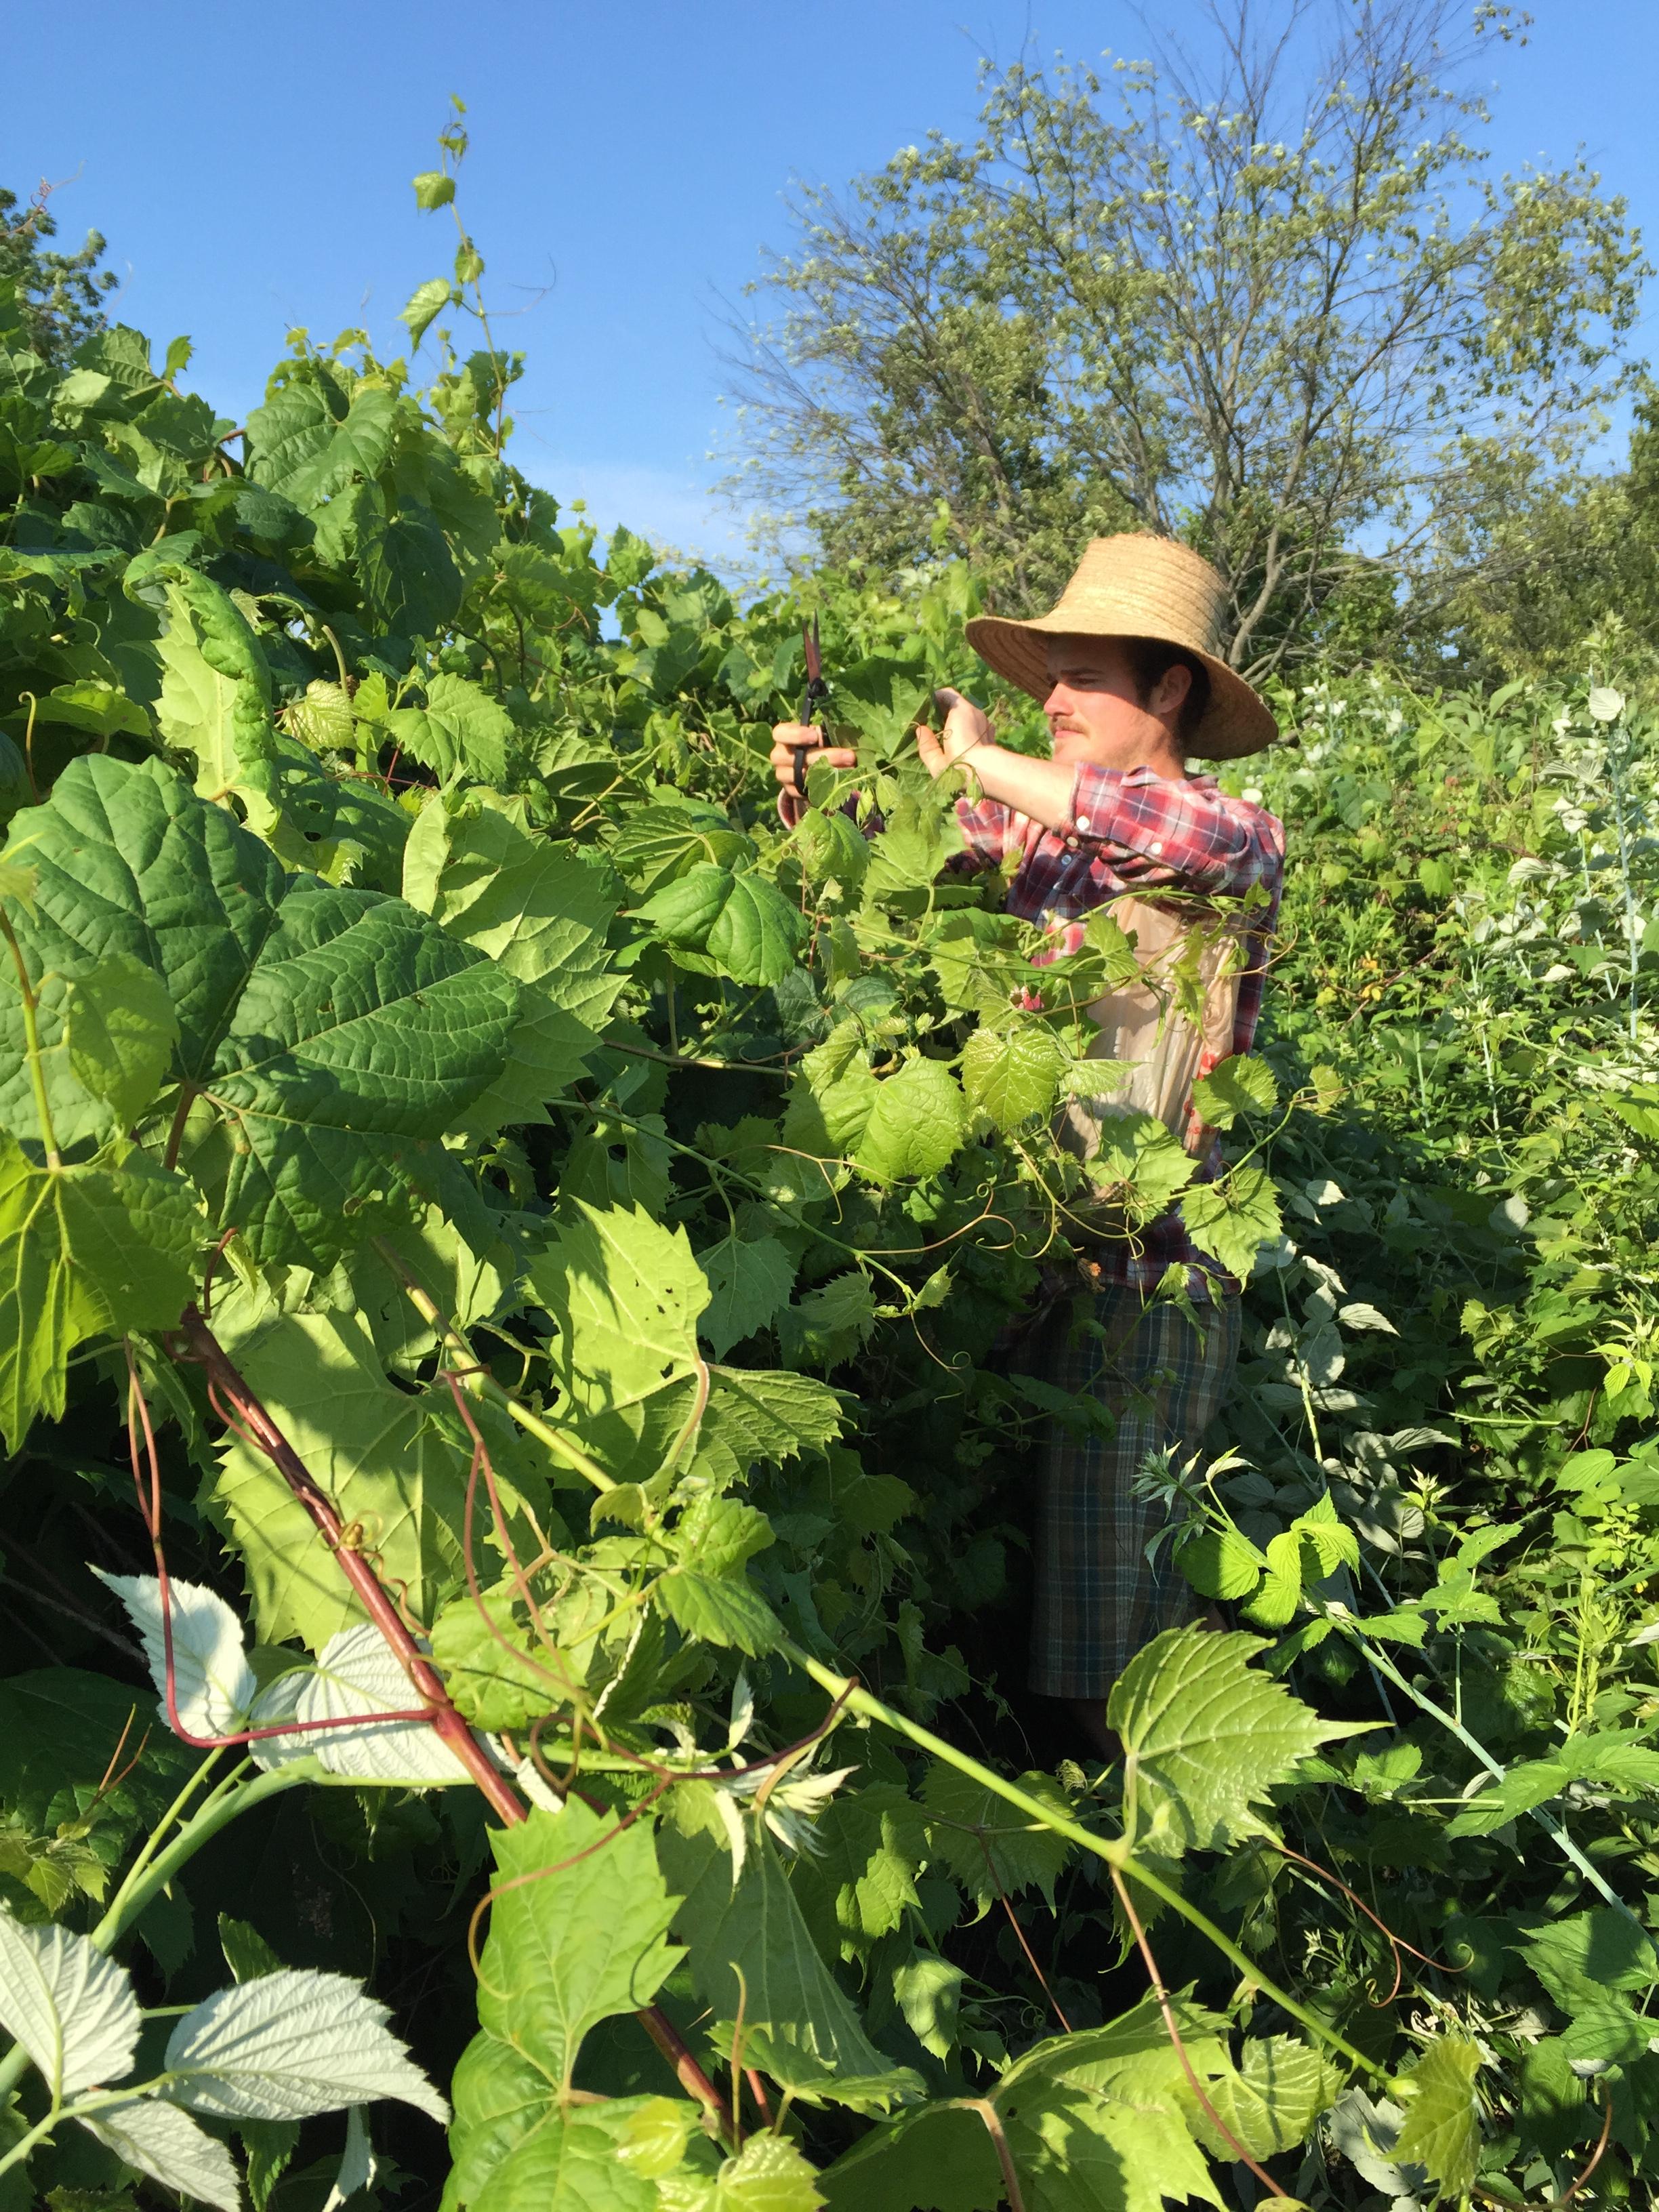 Chris_Bocz_harvesting_grape_leaves.JPG